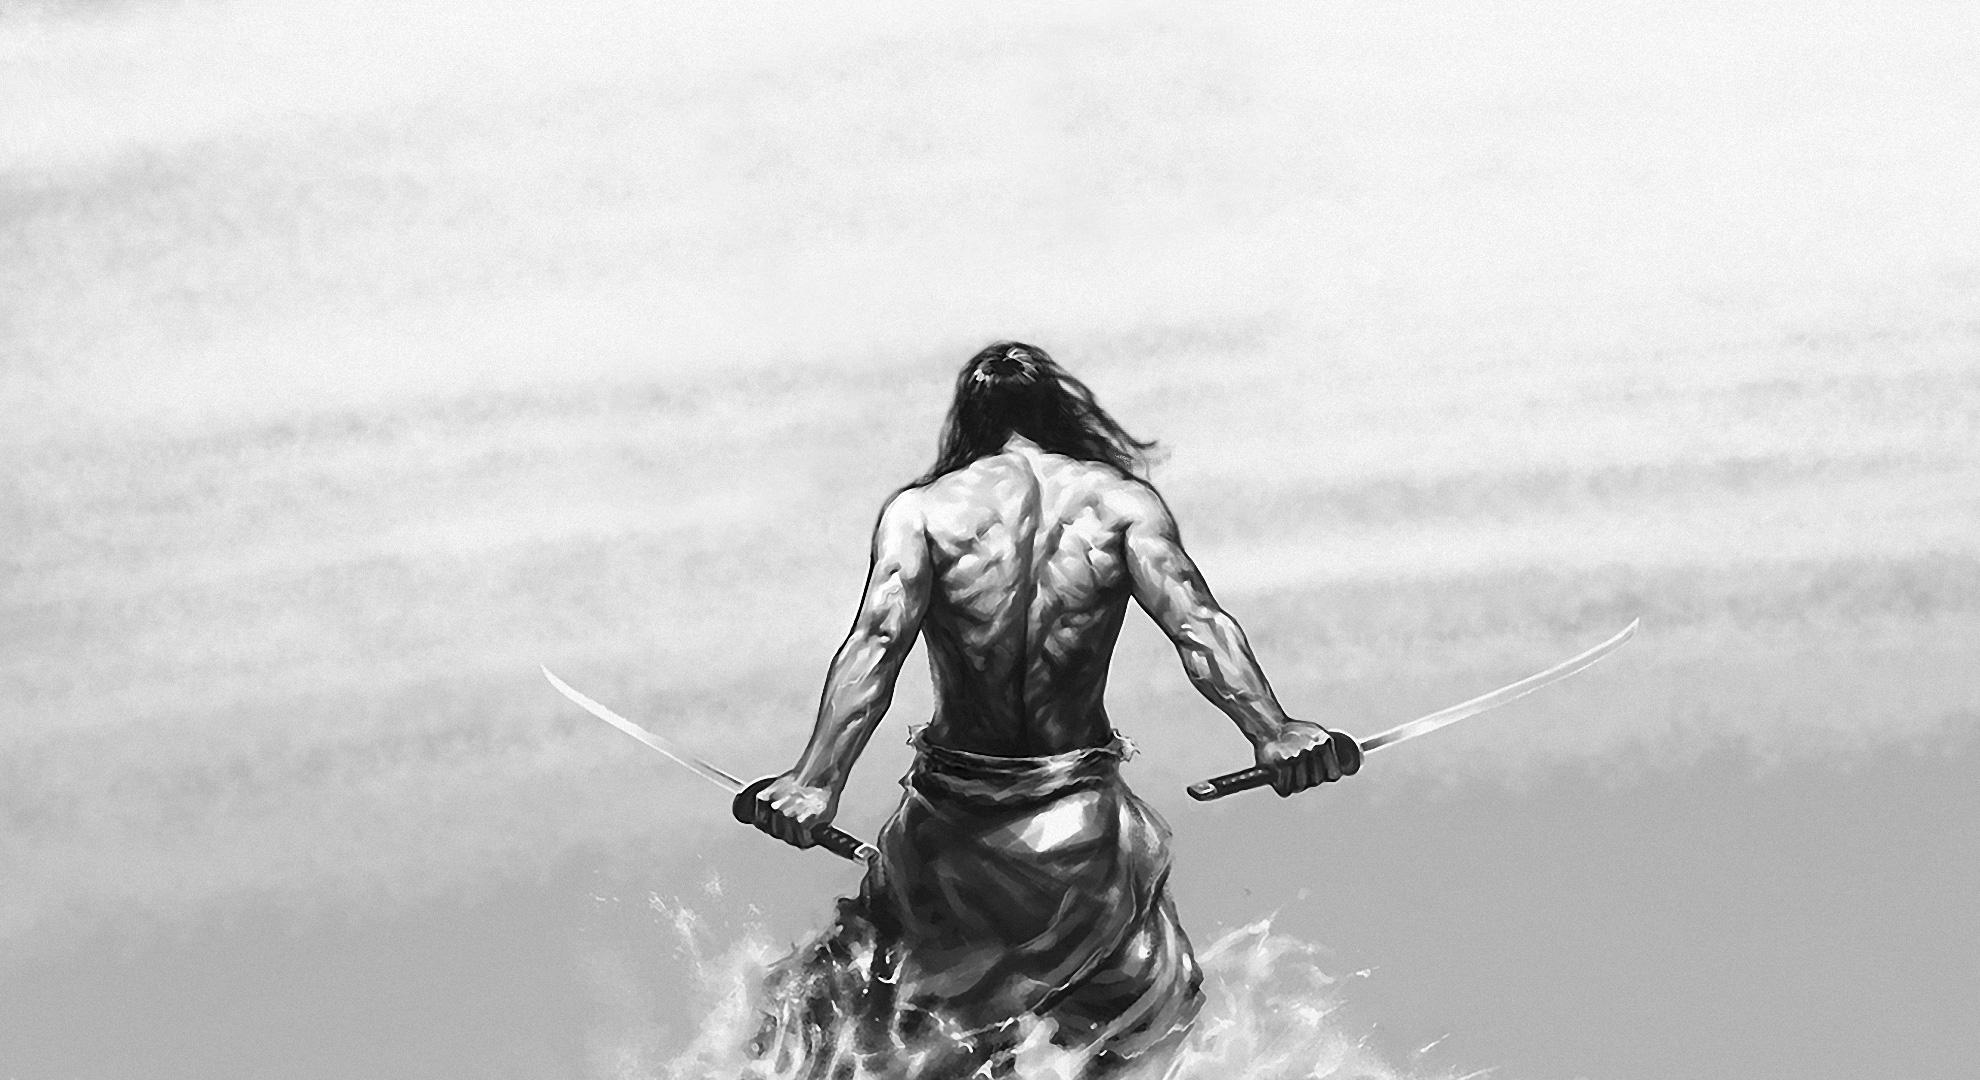 Drawn samurai hd wallpapers Abyss HD Wallpaper HD Backgrounds